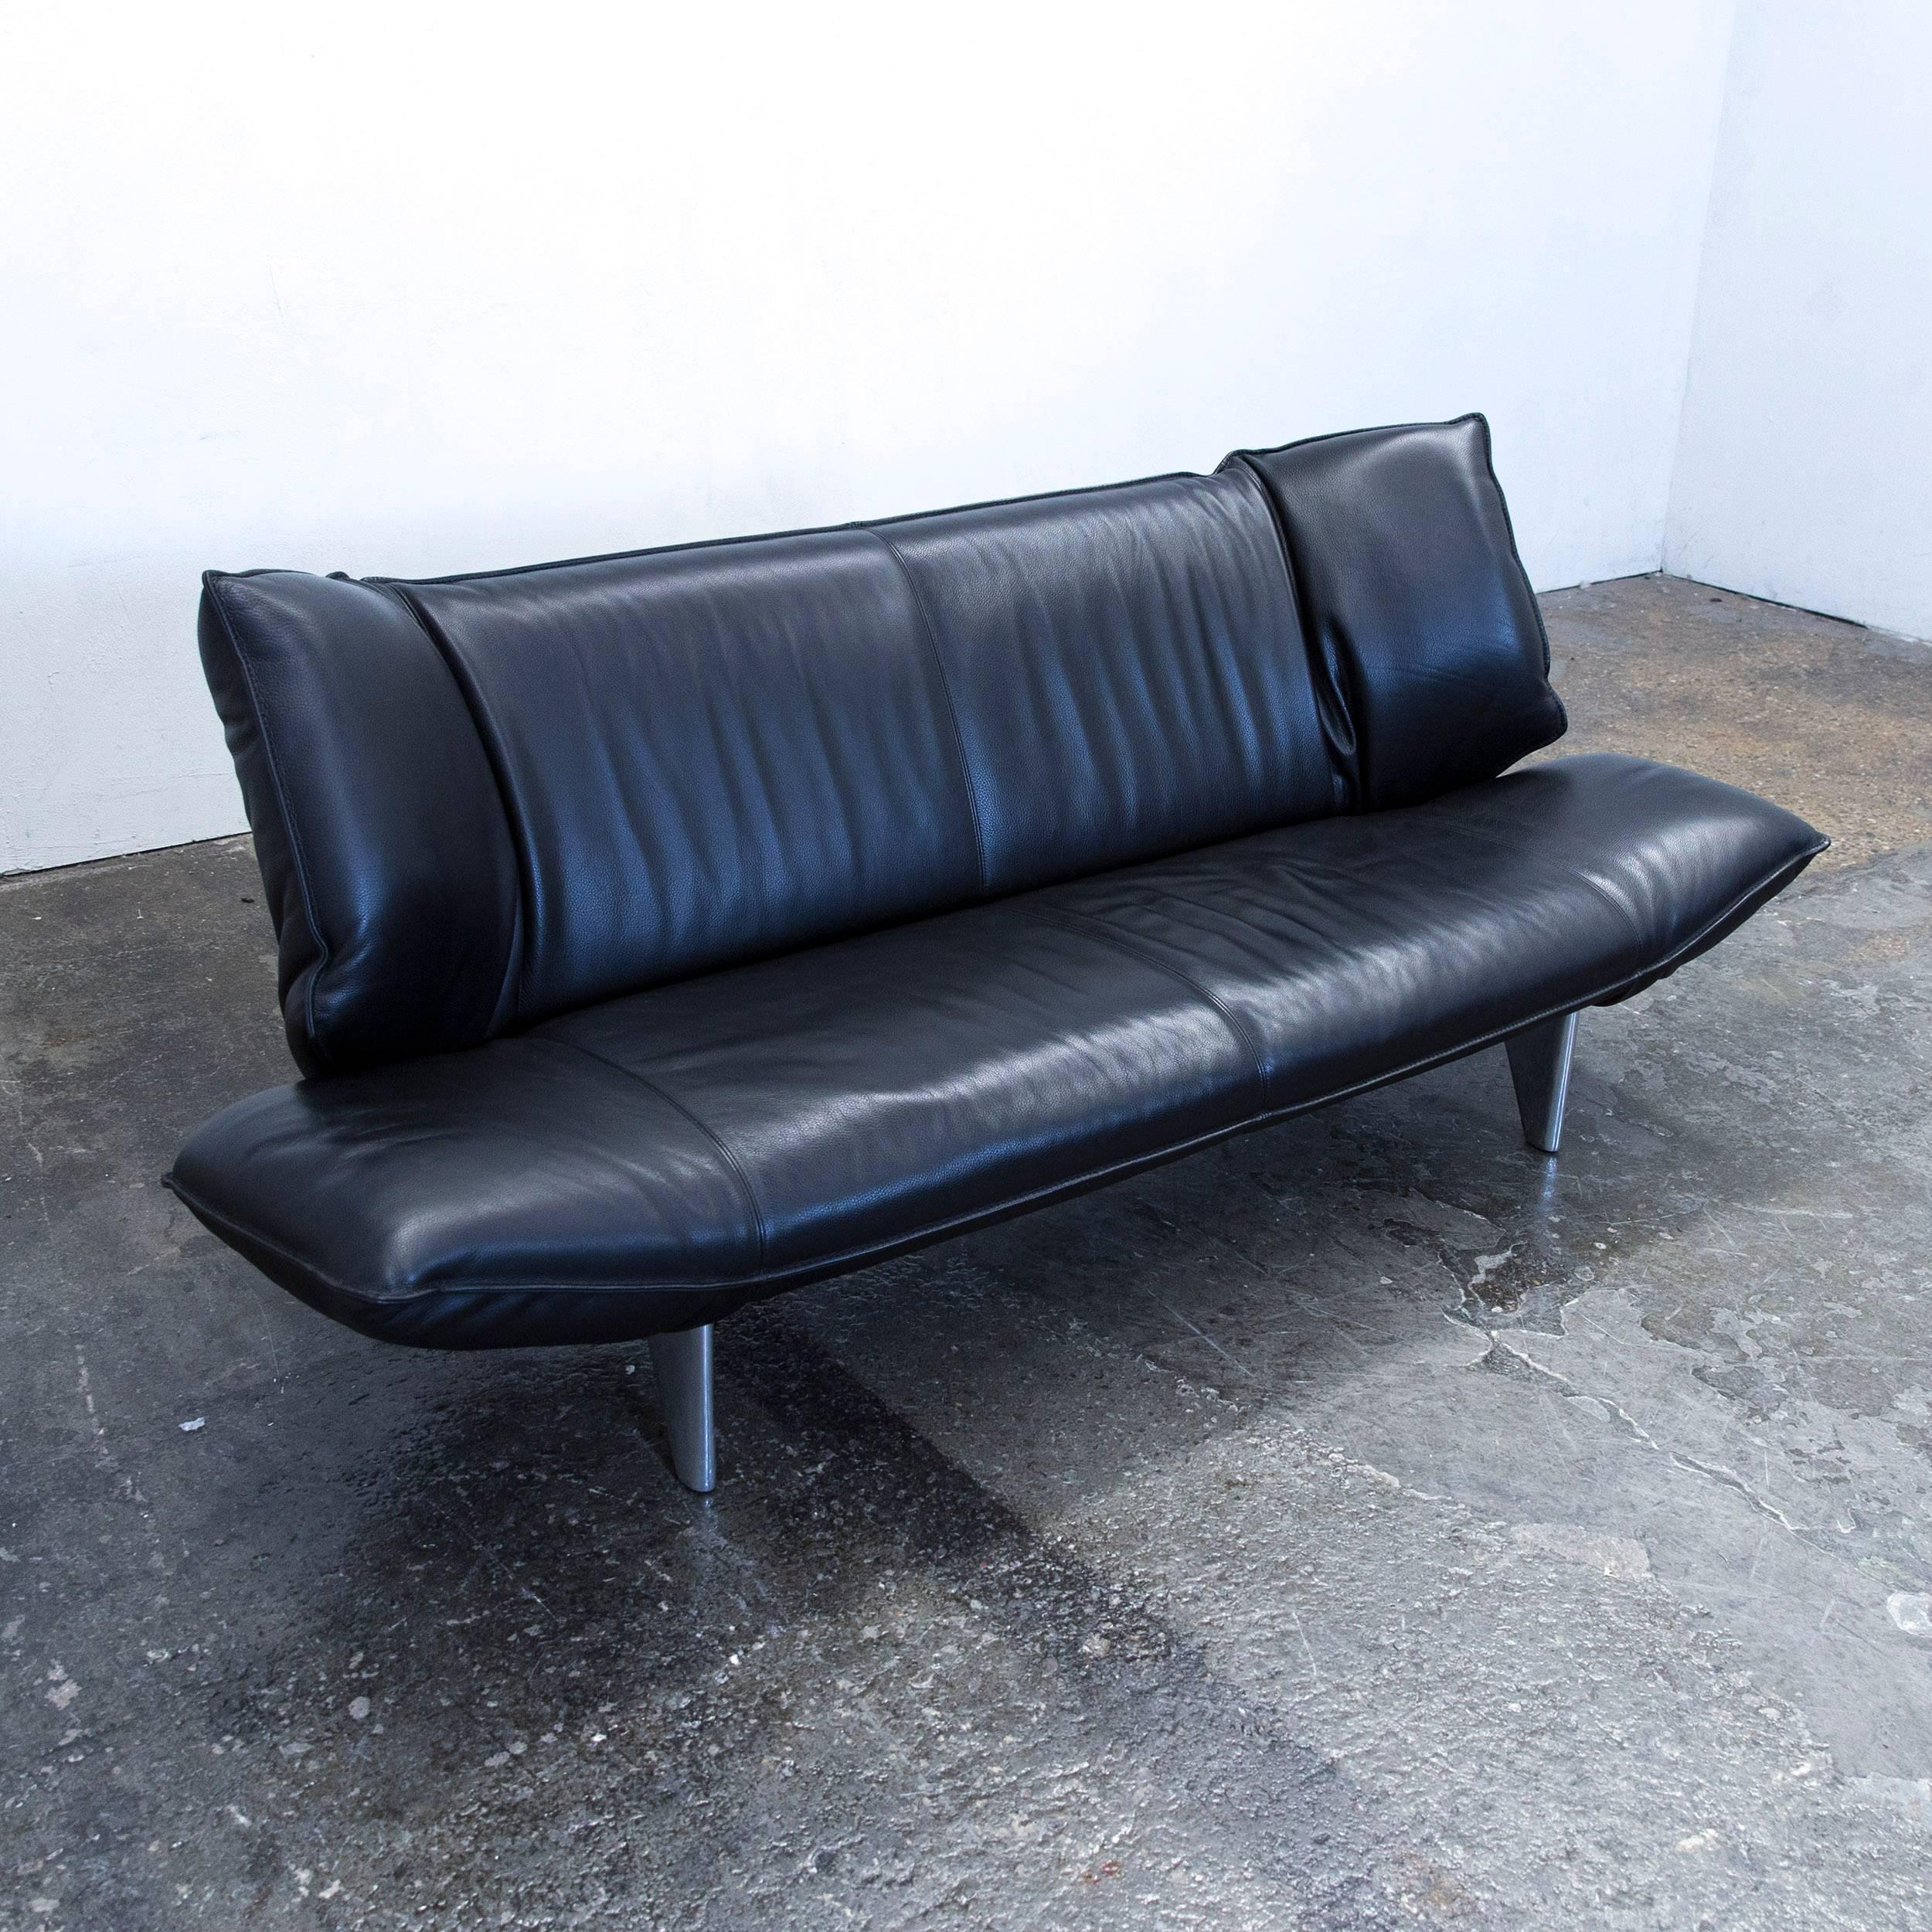 German Leolux Tango Designer Leather Sofa Black Two Seat Function Modern  For Sale